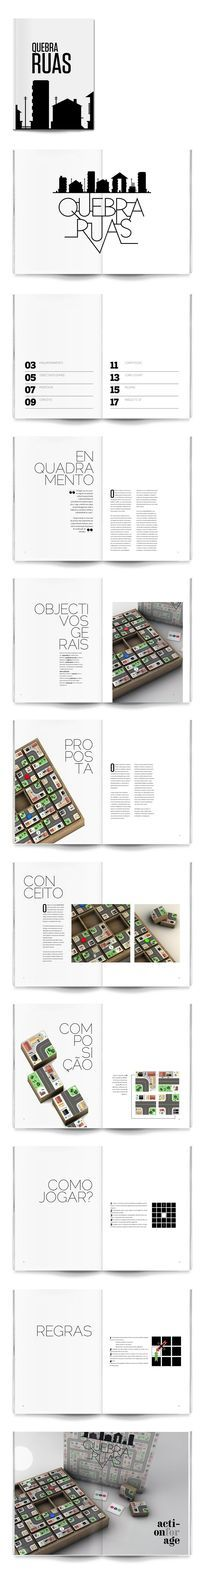 http://designspiration.net/popular/page/110/?marker=974887853261